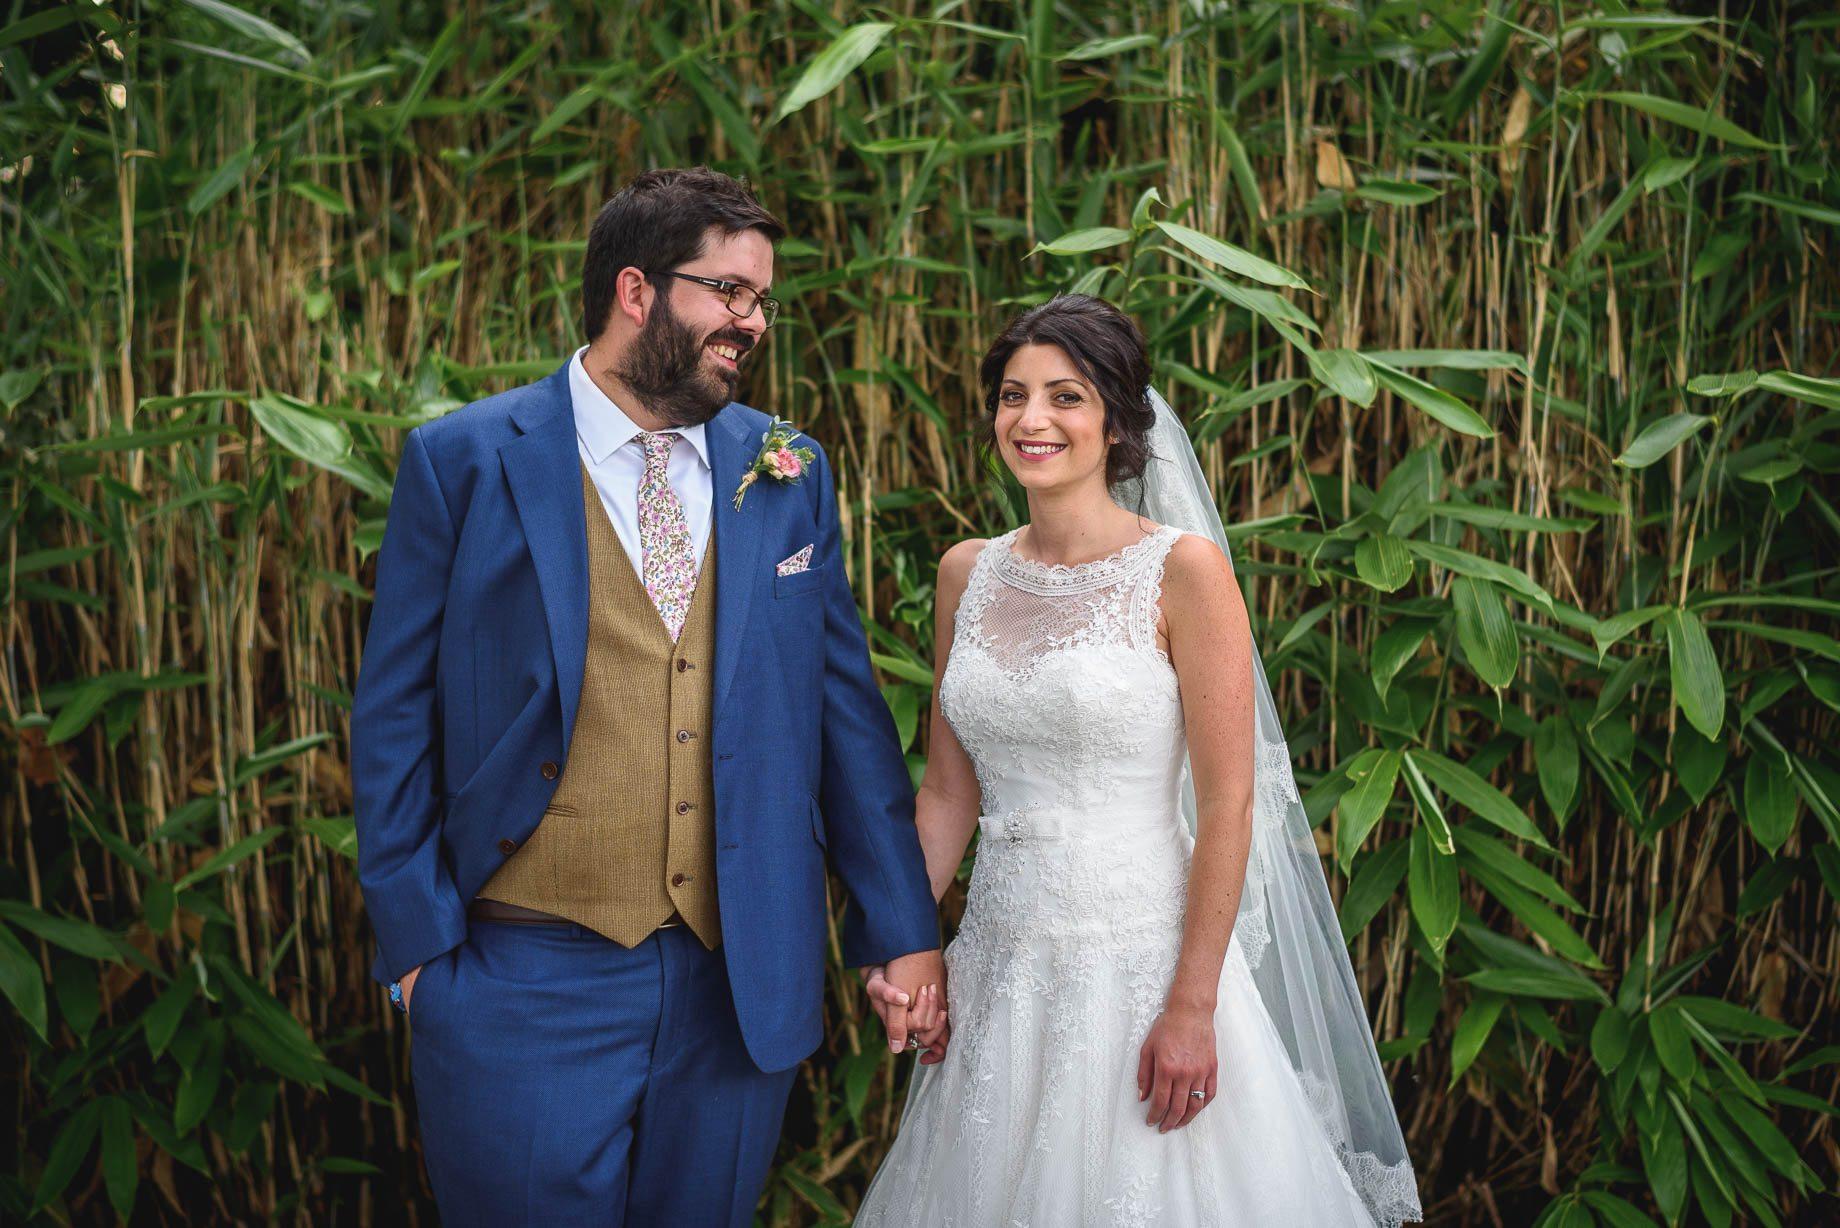 Gaynes Park wedding photography - Guy Collier Photography - Rachel and Jon (145 of 169)